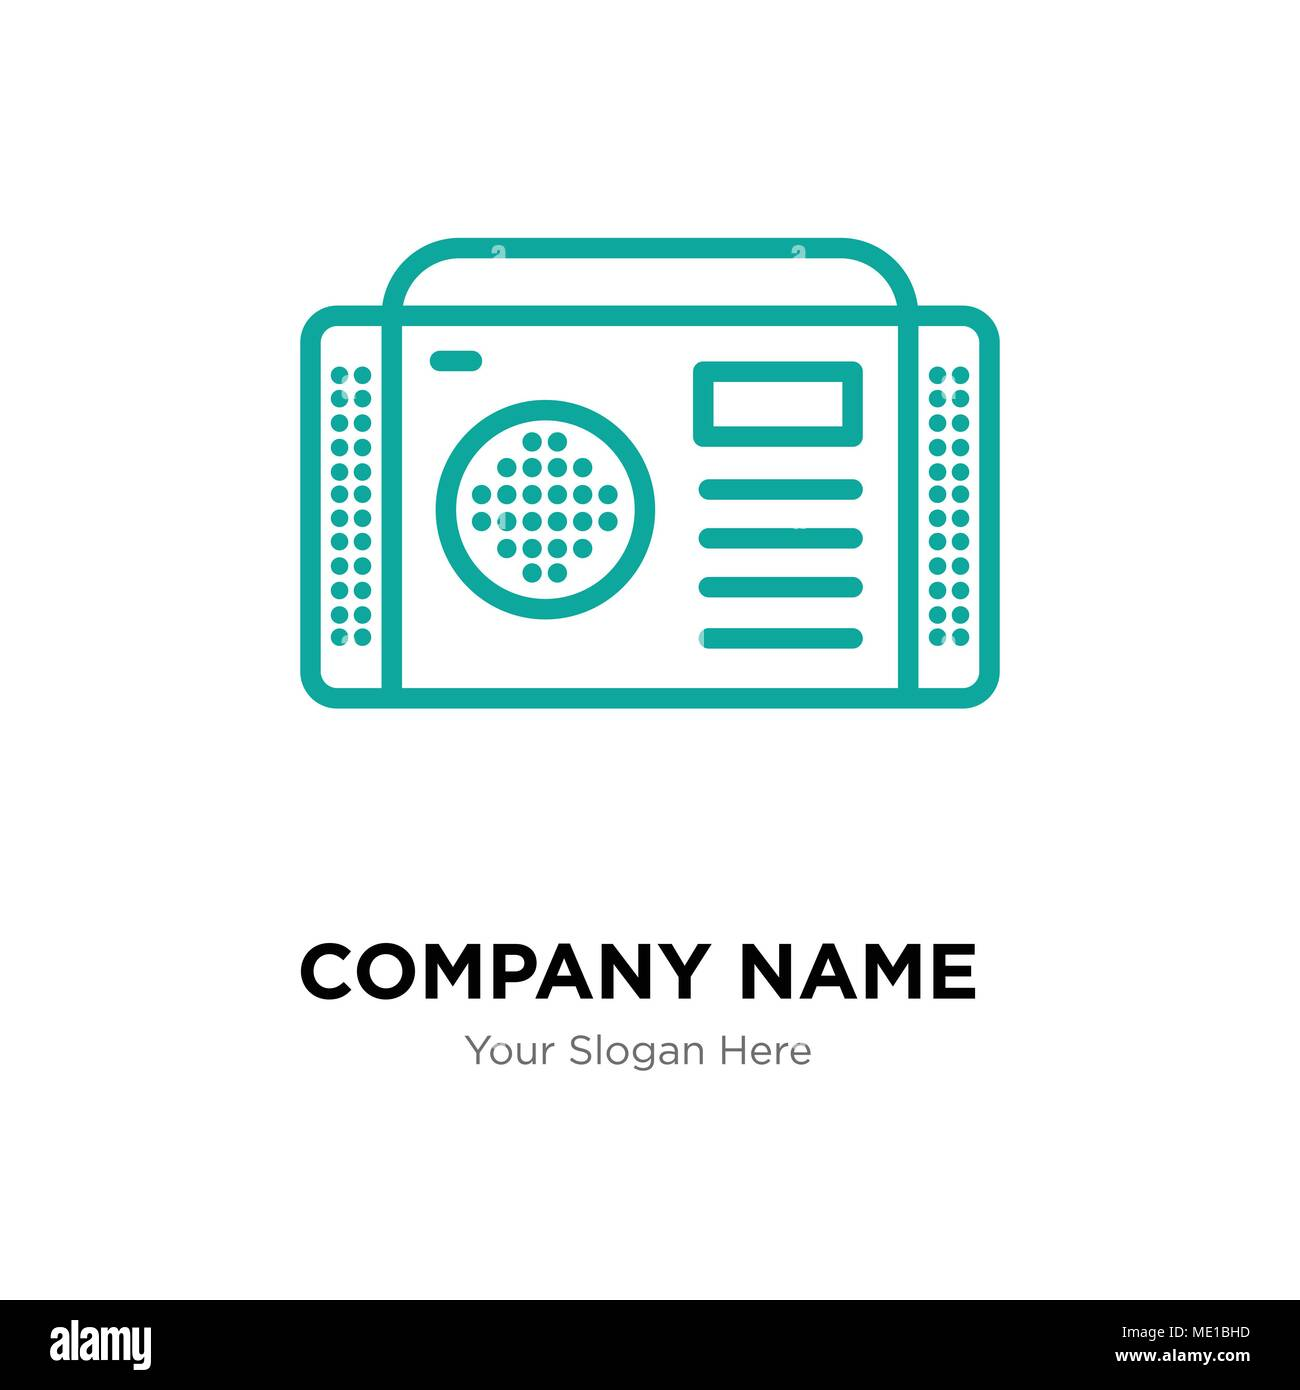 Radio company logo design template, Business corporate vector icon Stock Vector